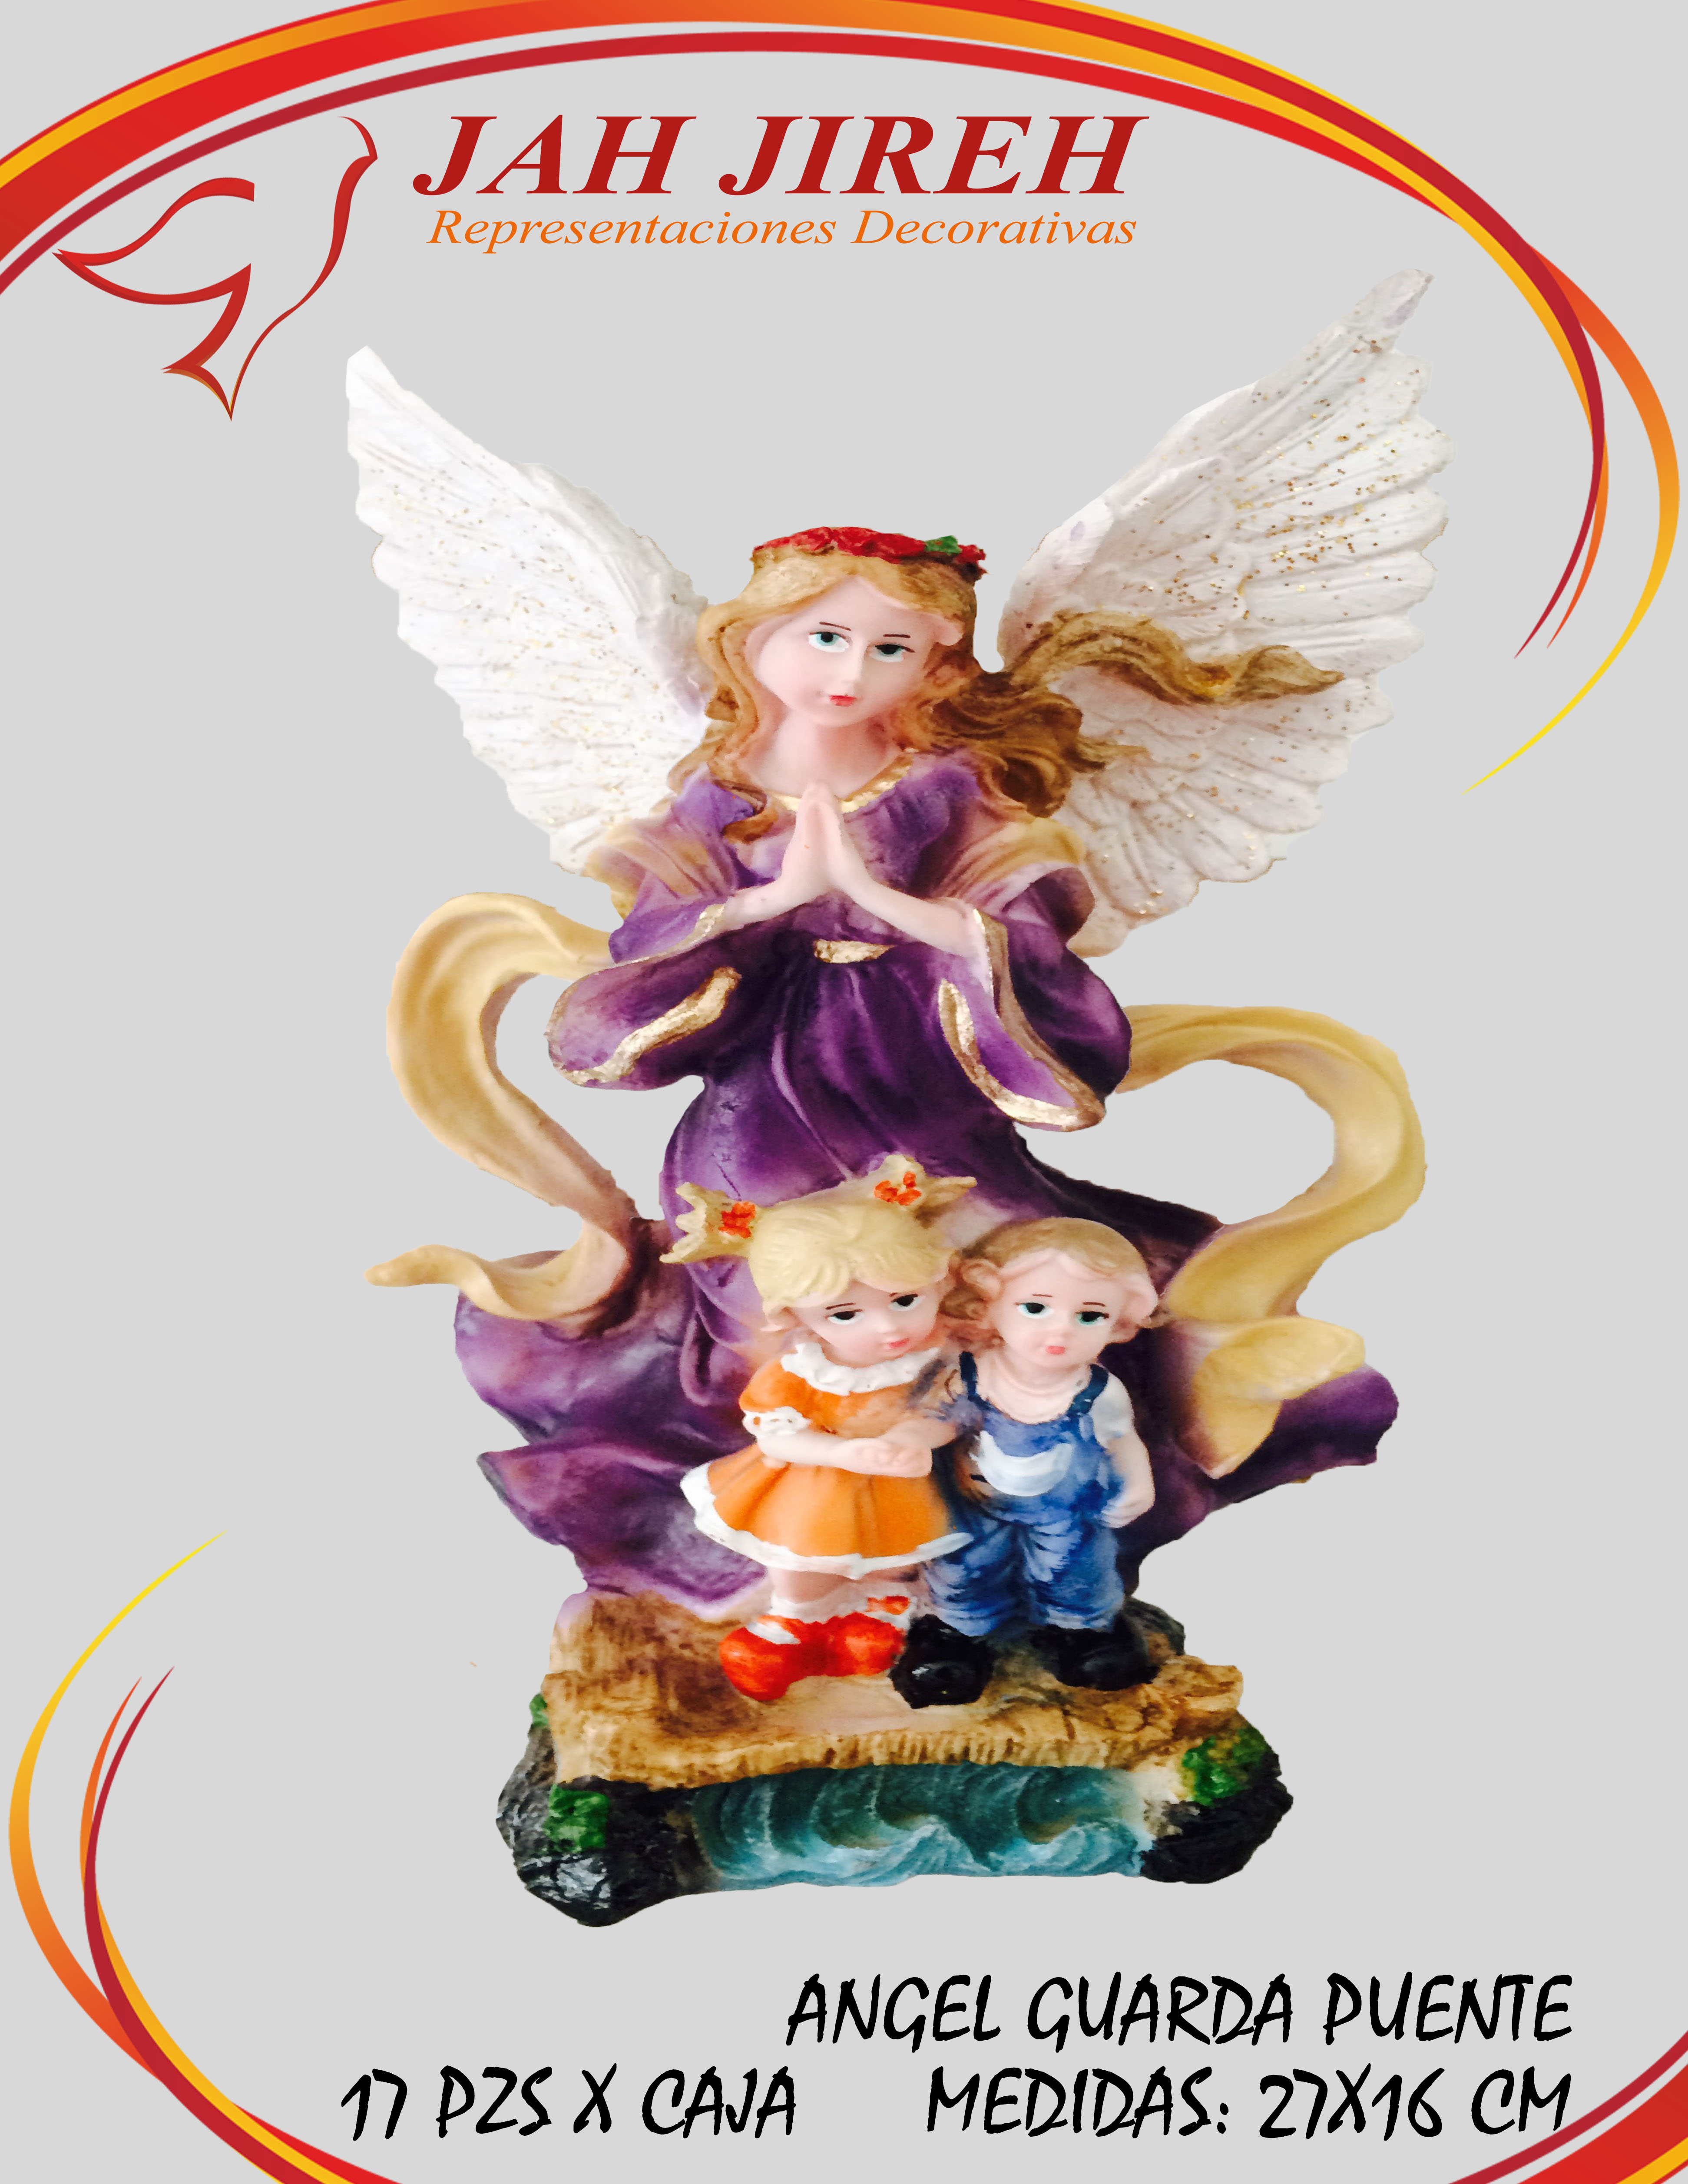 https://0201.nccdn.net/1_2/000/000/14f/bc0/angel--guarda-puente.jpg